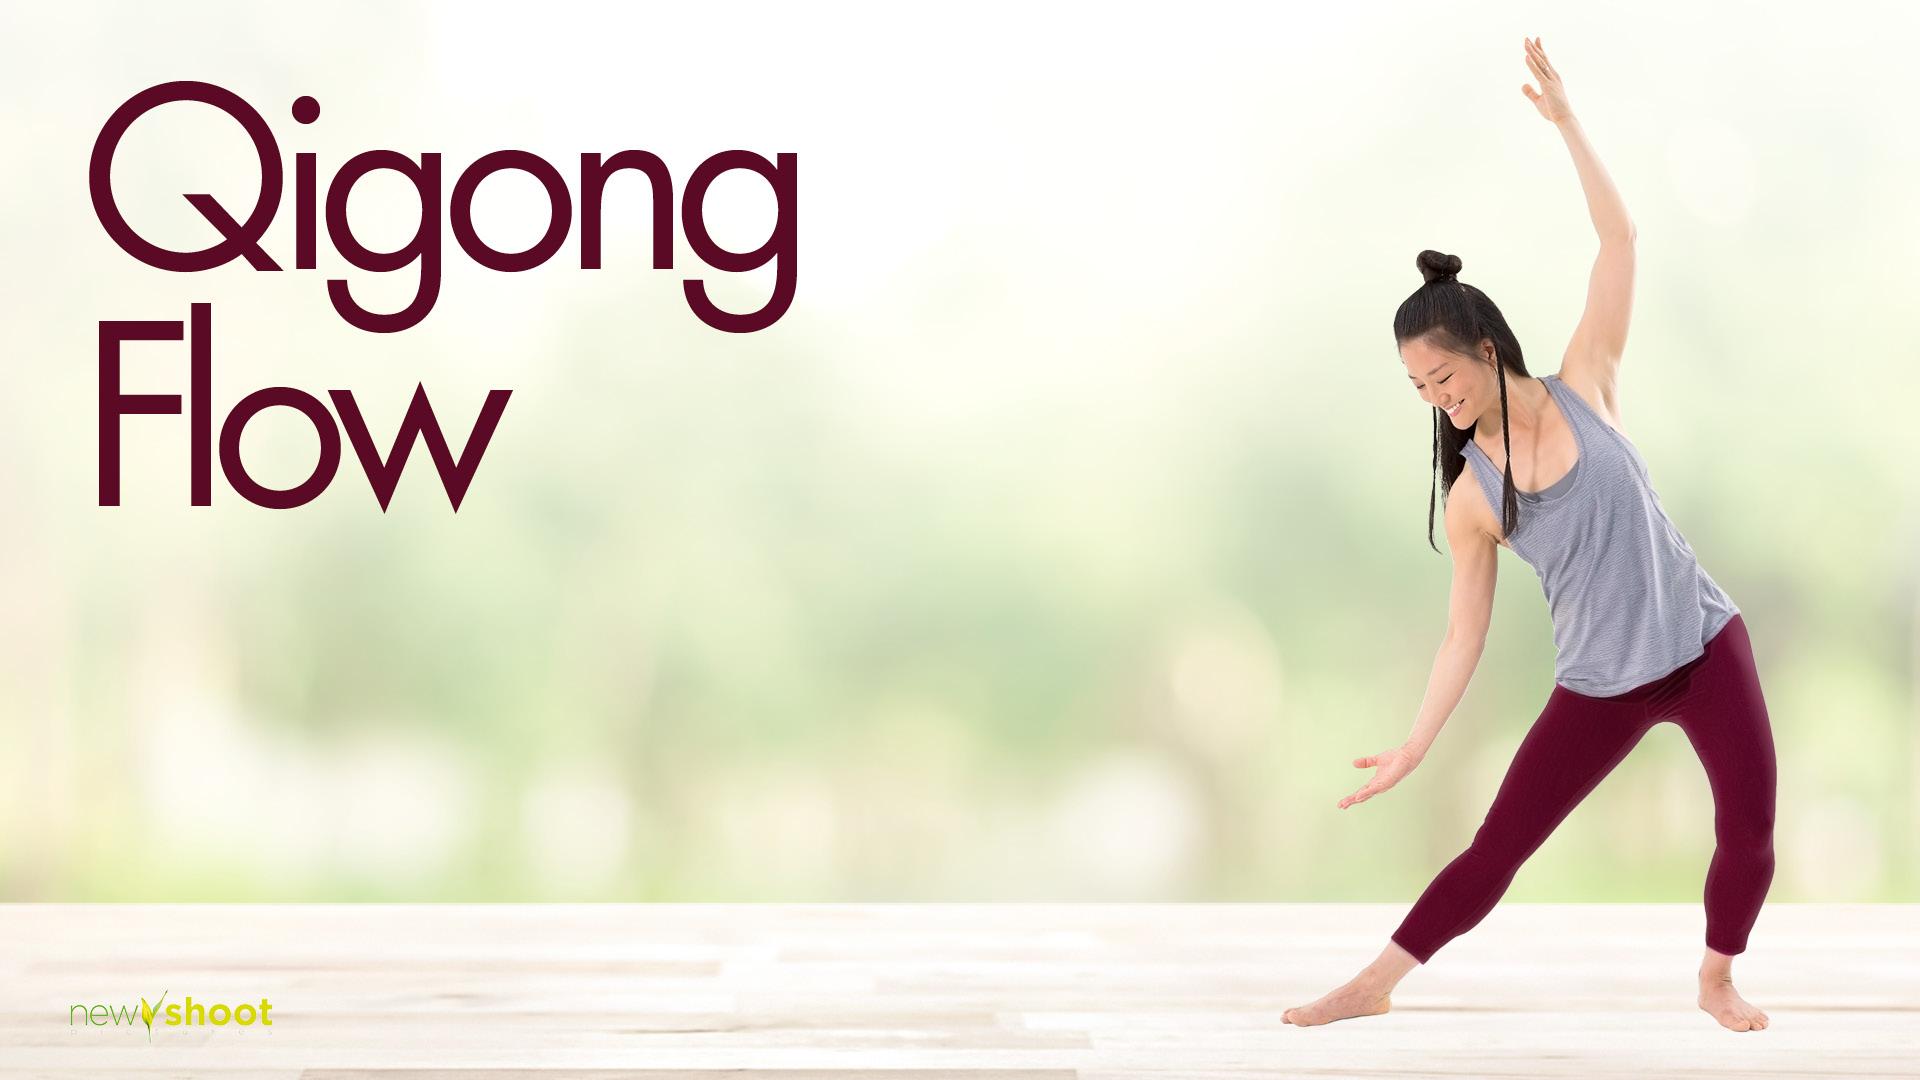 Qigong Flow